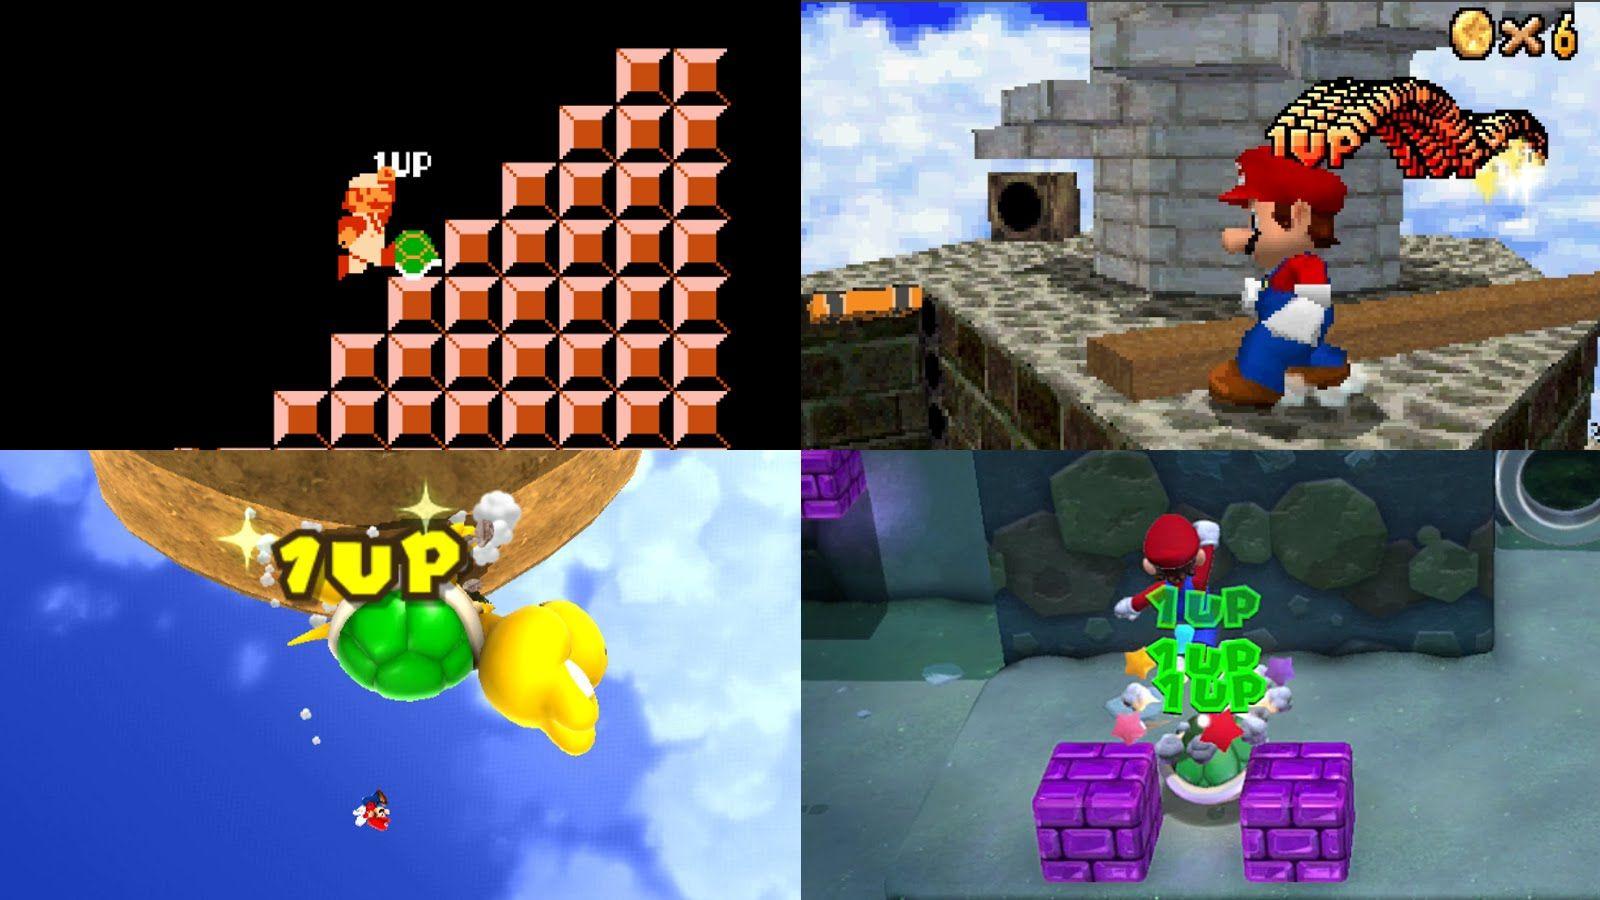 Evolution of the Infinite Lives Trick in Mario games | Super Mario